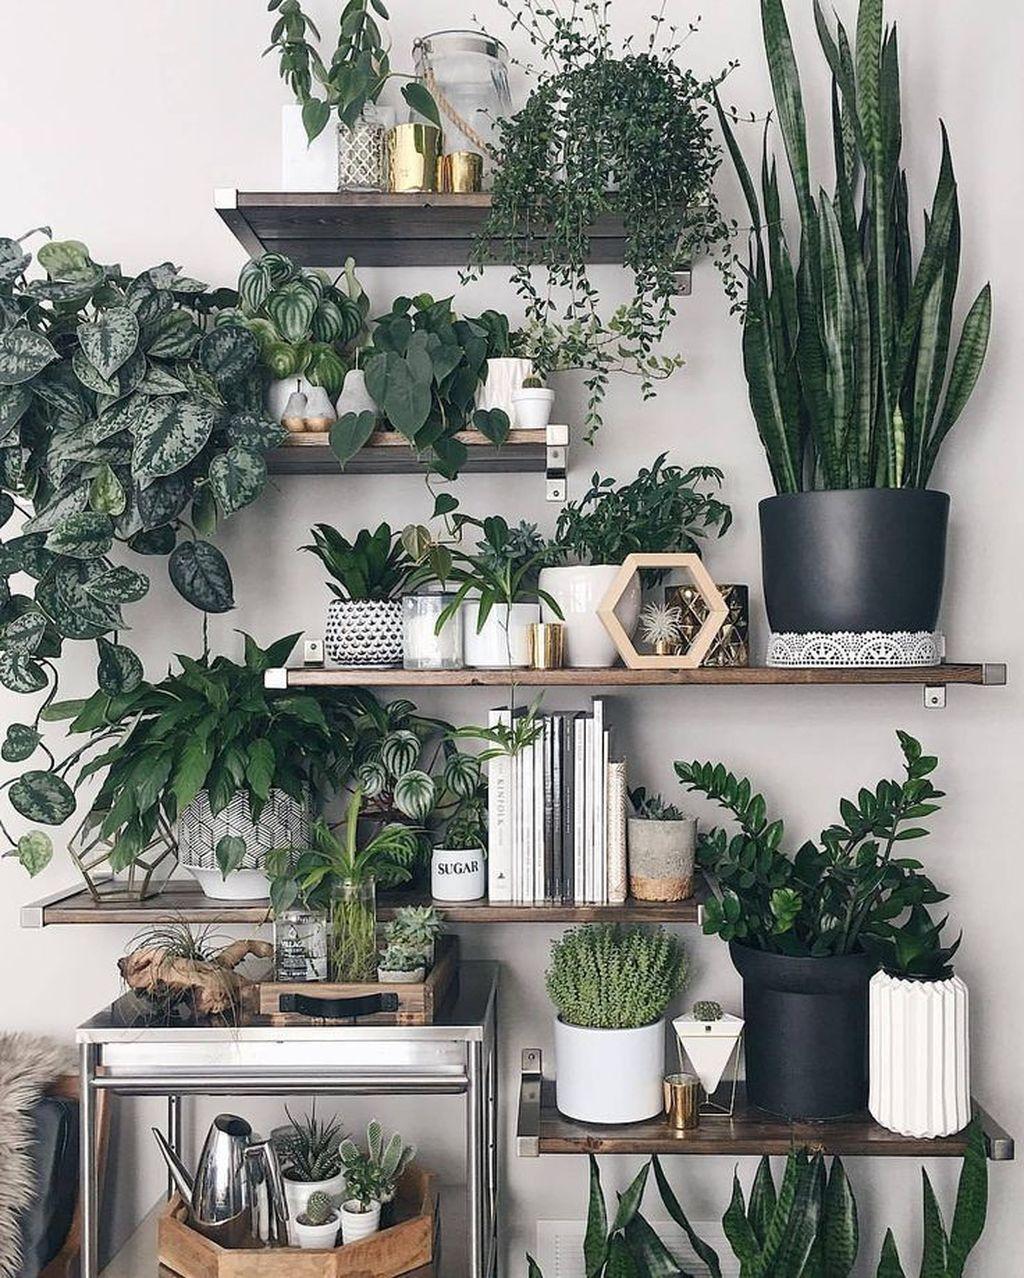 37 Diy Indoor Plant Display Ideas - BESTHOMISH